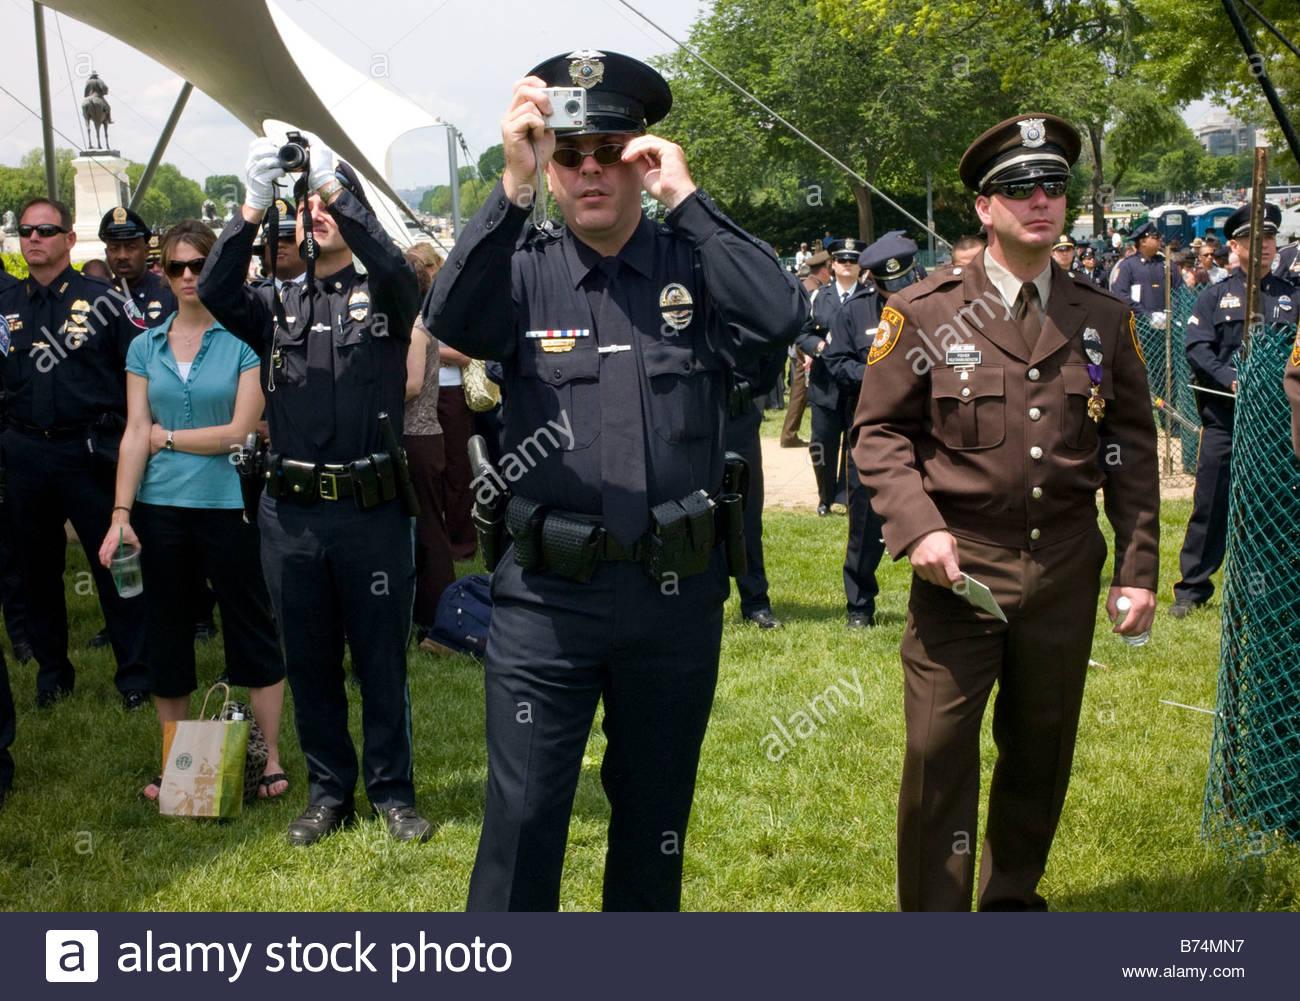 WASHINGTON DC May 15 Lexington Mass Officer Sal Mirabella Jr with wife Jessica far left Davie Fla Officer Bryan - Stock Image